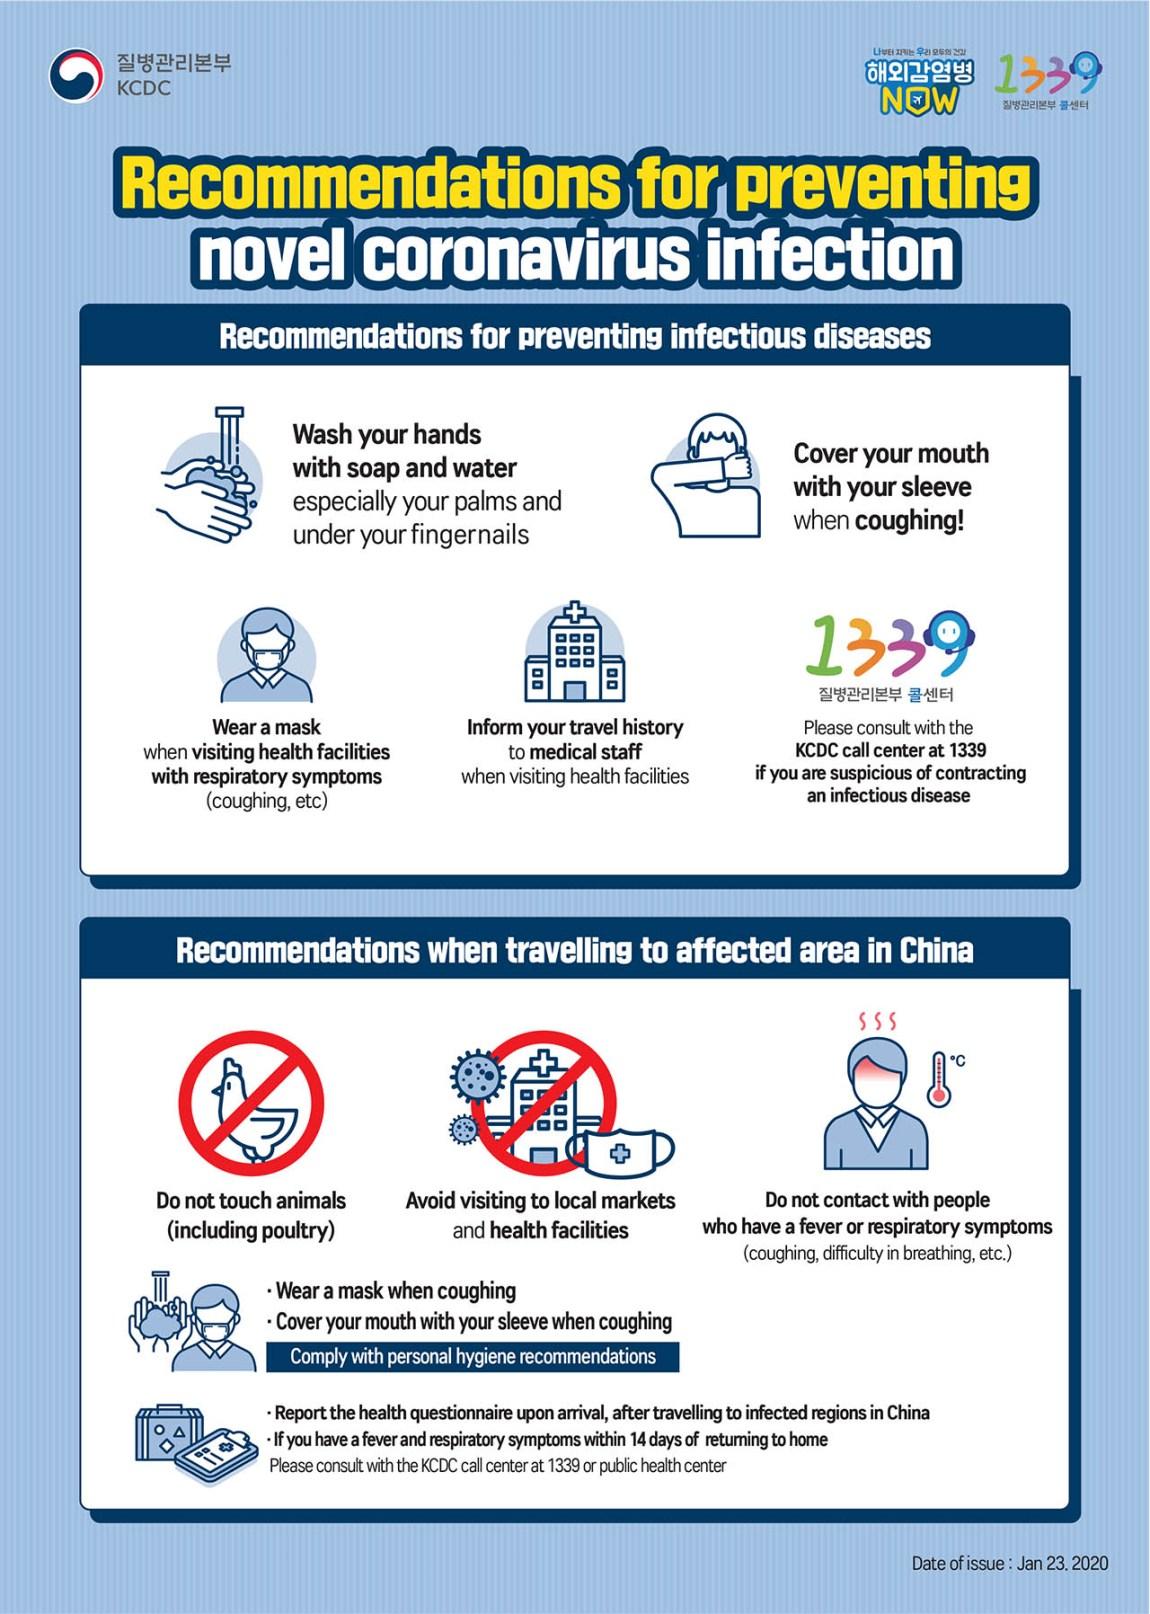 Korea Travel Advice in relation to the novel coronavirus 2019-nCoV